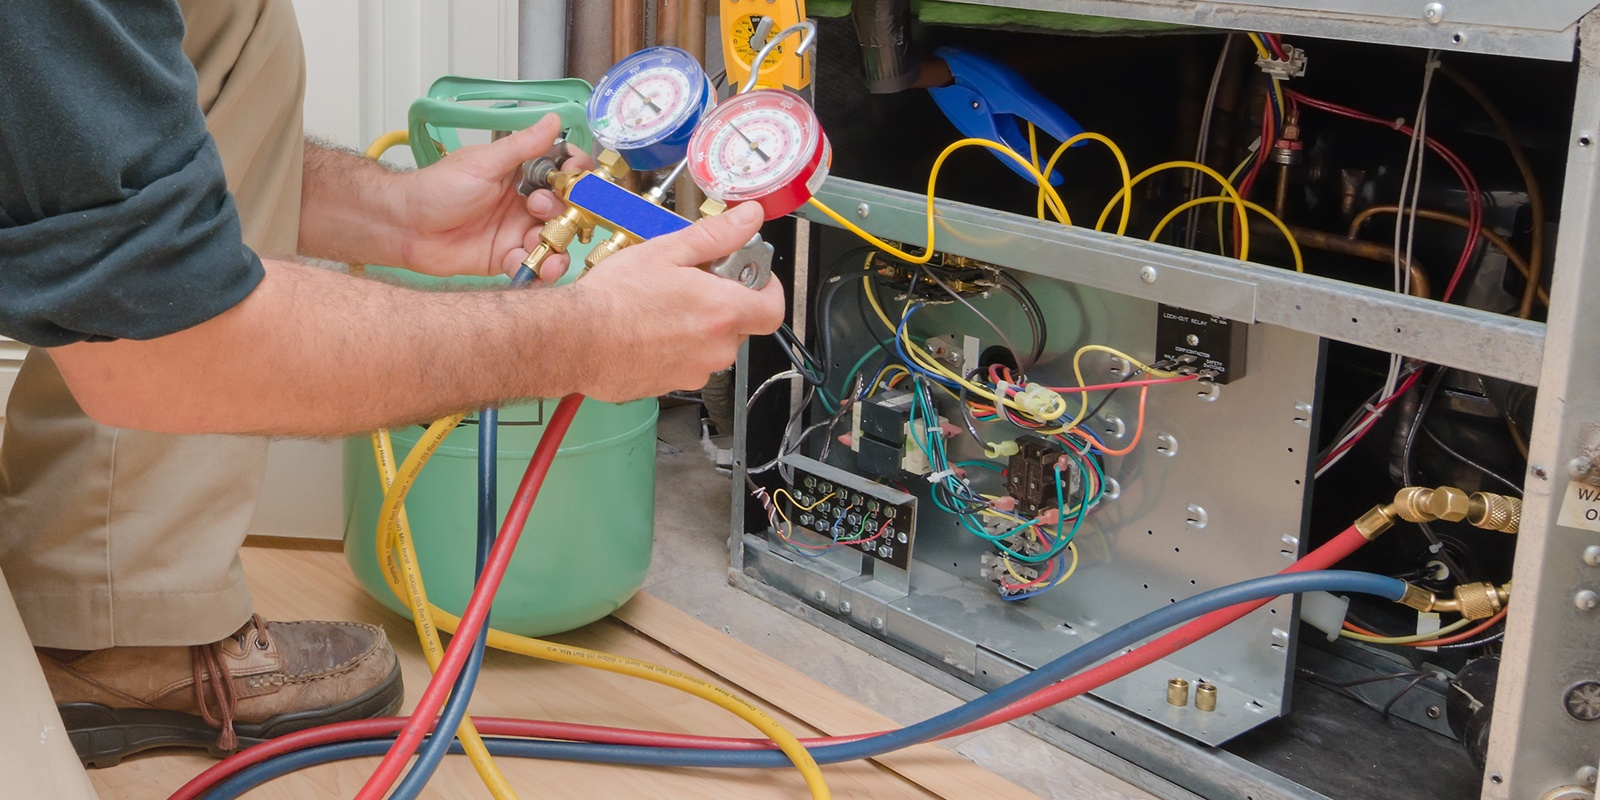 Image for HVAC Risks to Keep in Mind as Summer Heat Begins